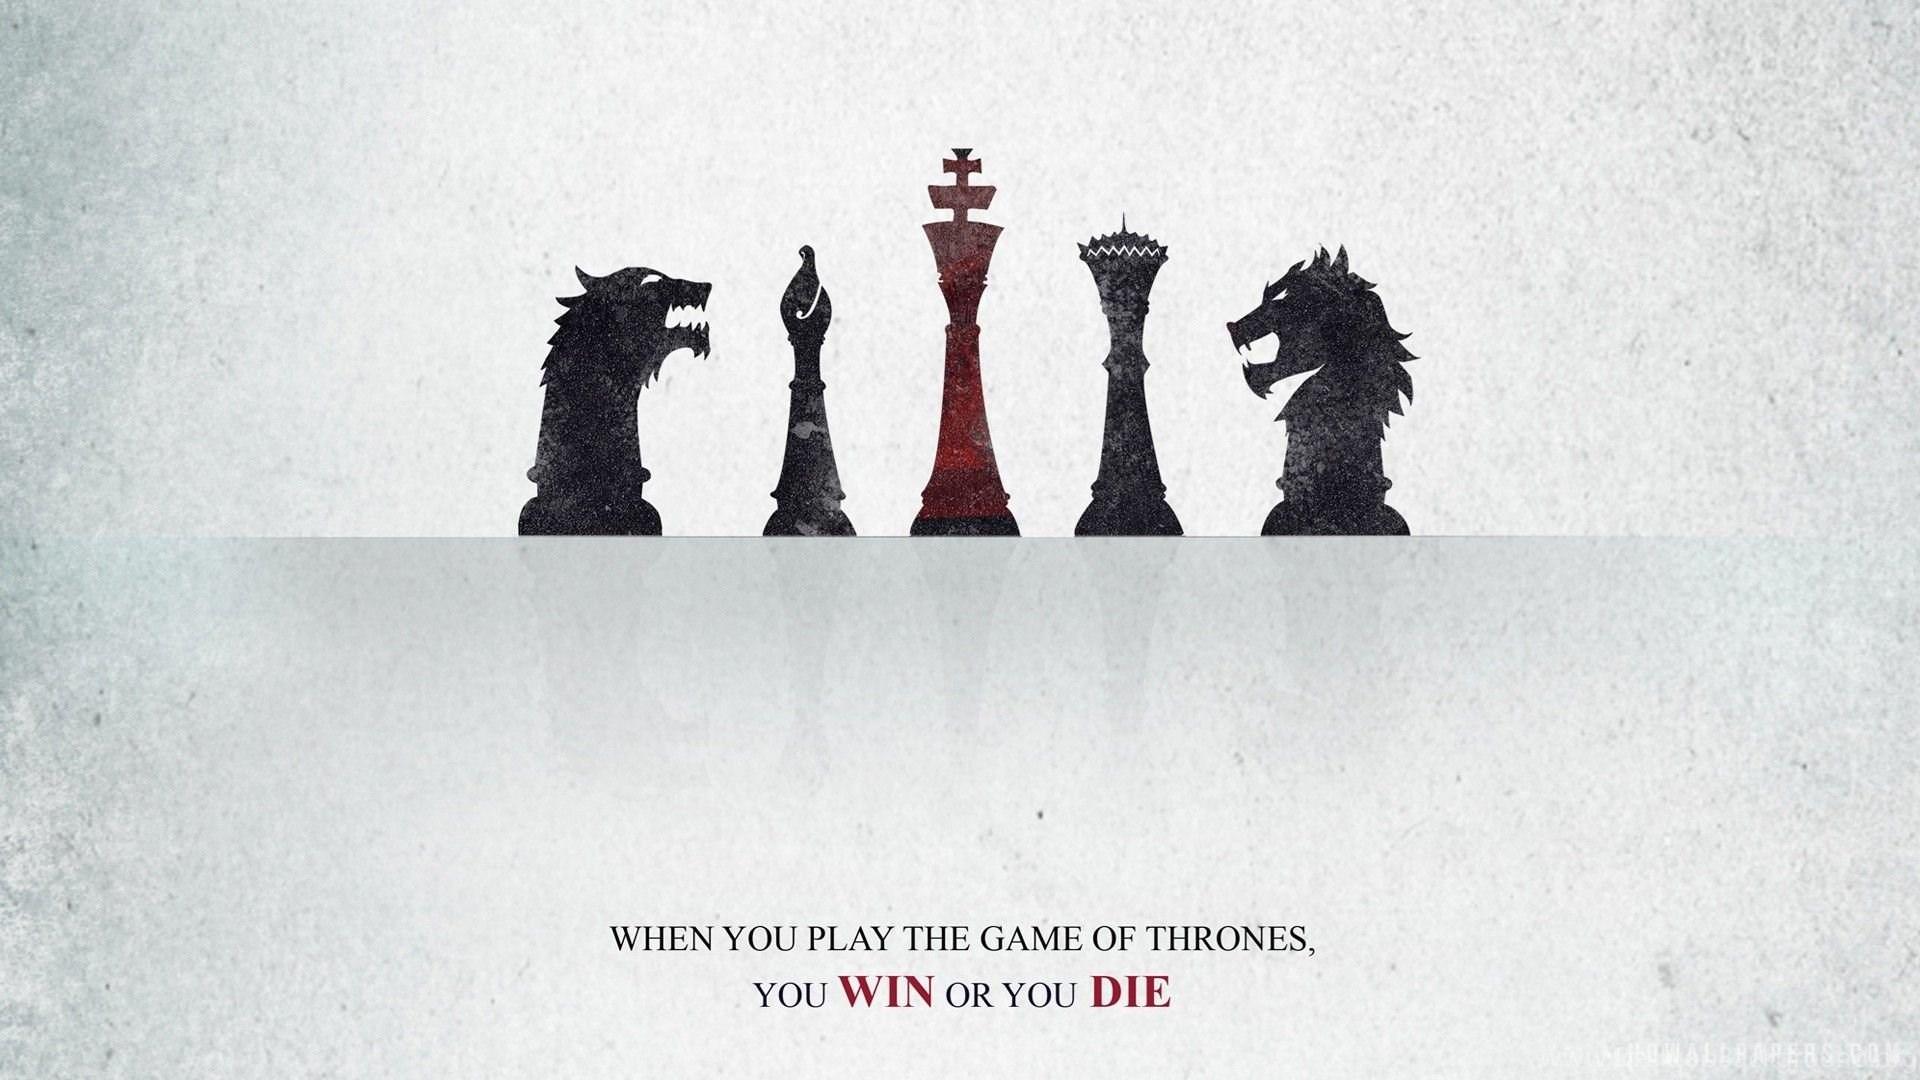 Game Of Thrones Houses Wallpaper Backgrounds Desktop Background